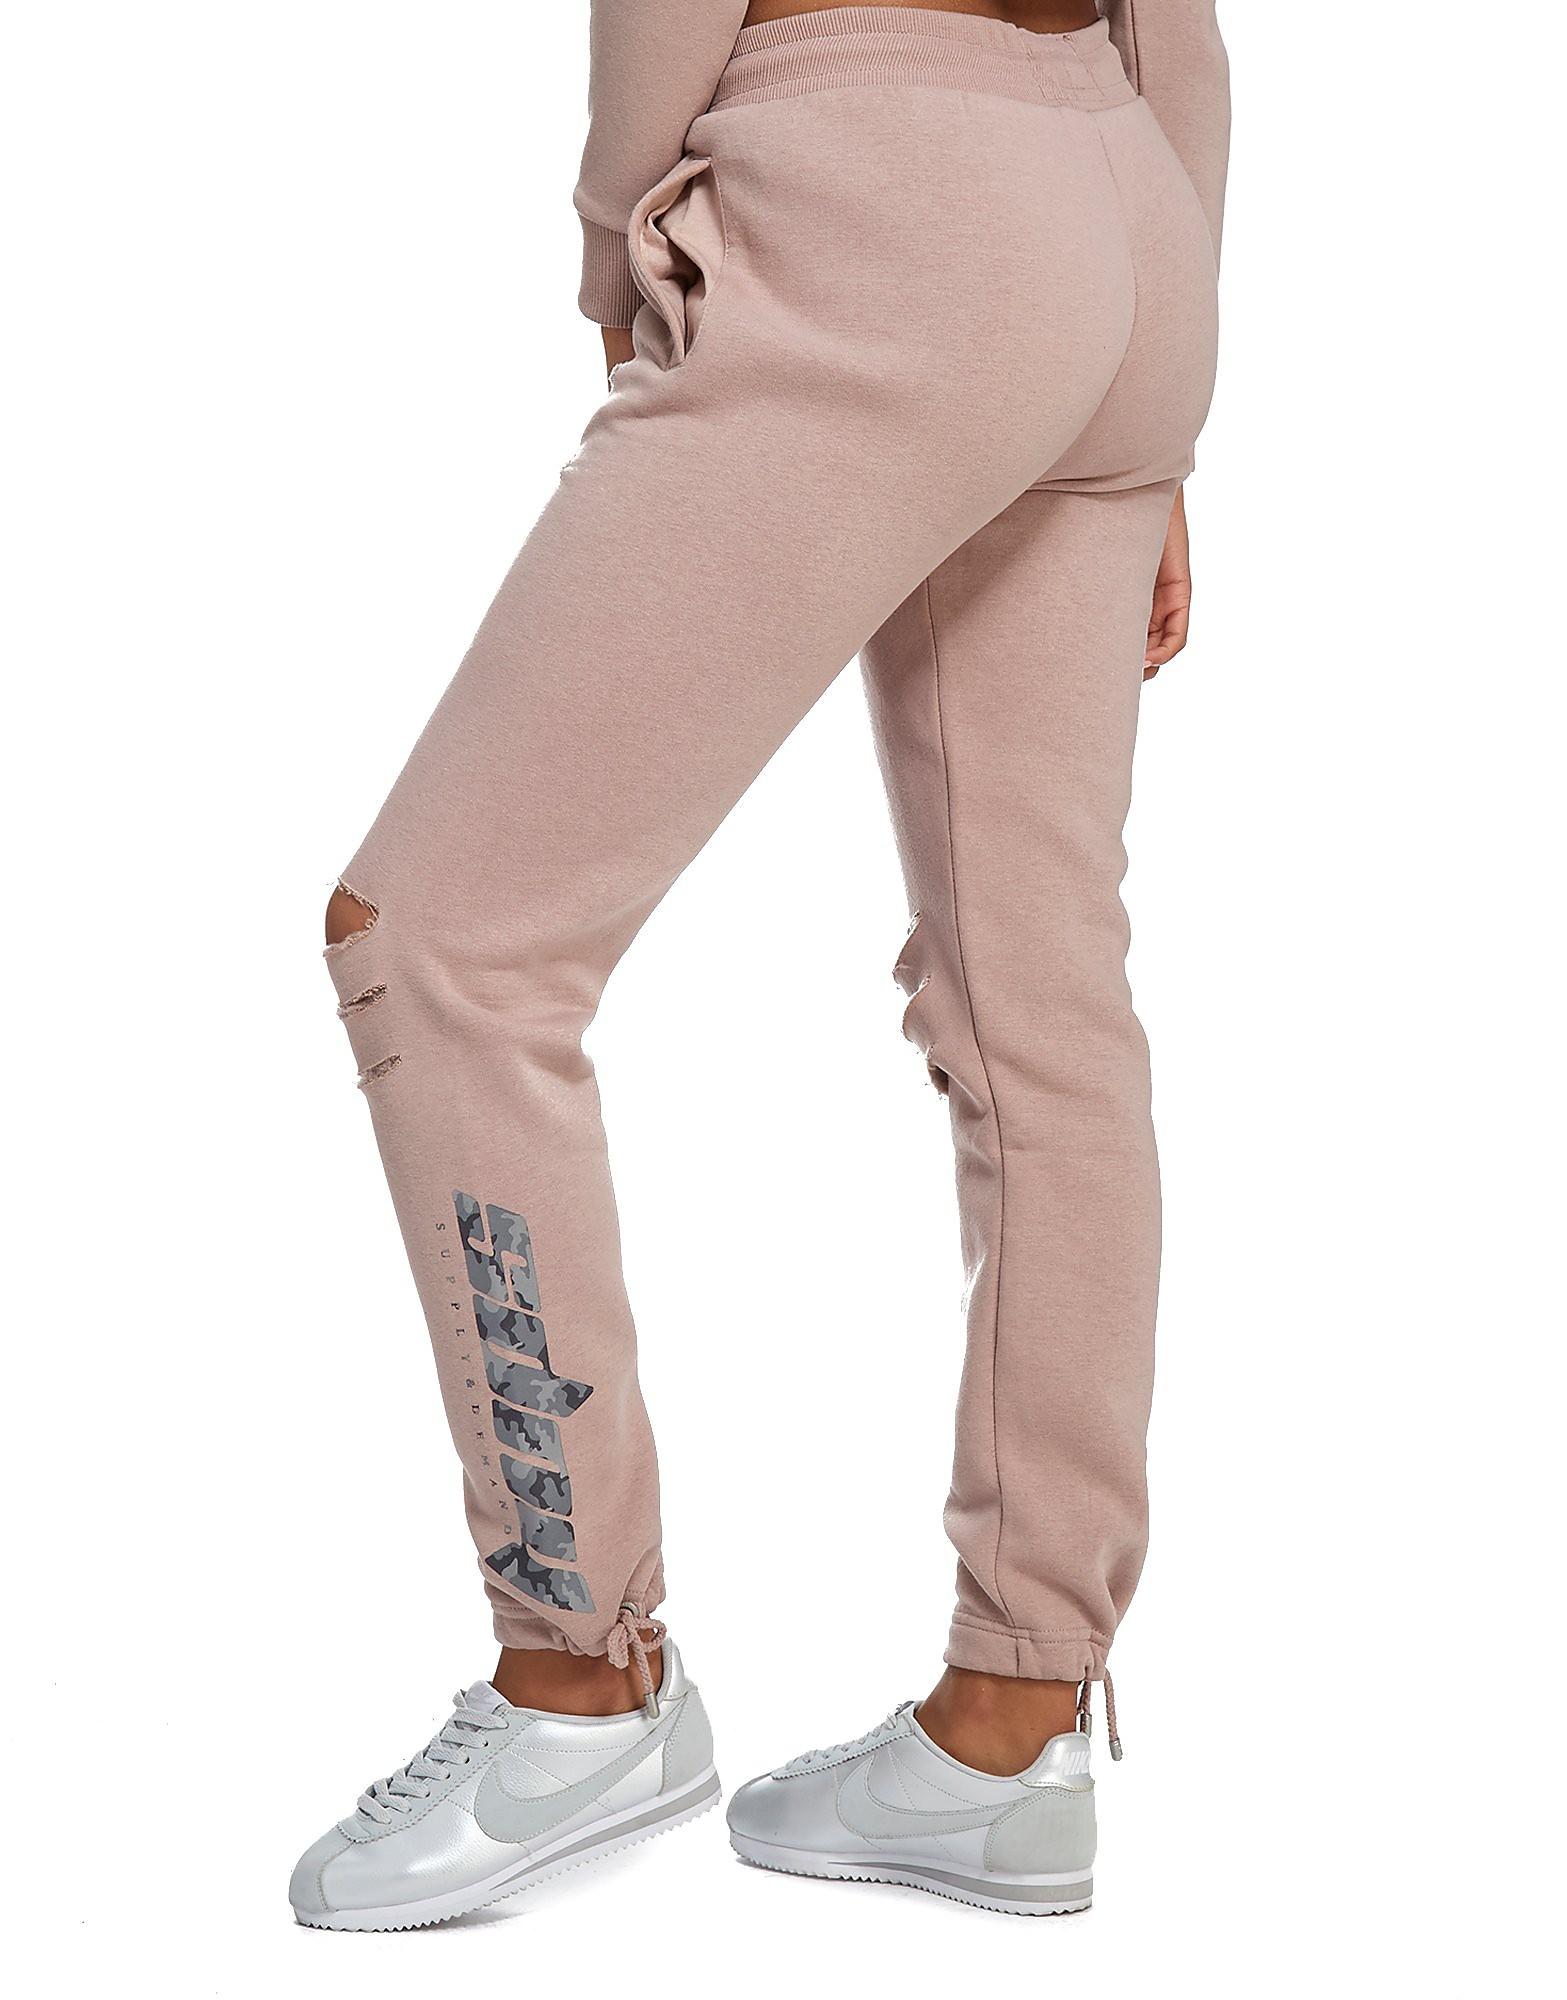 Supply & Demand Camo Tie Joggers